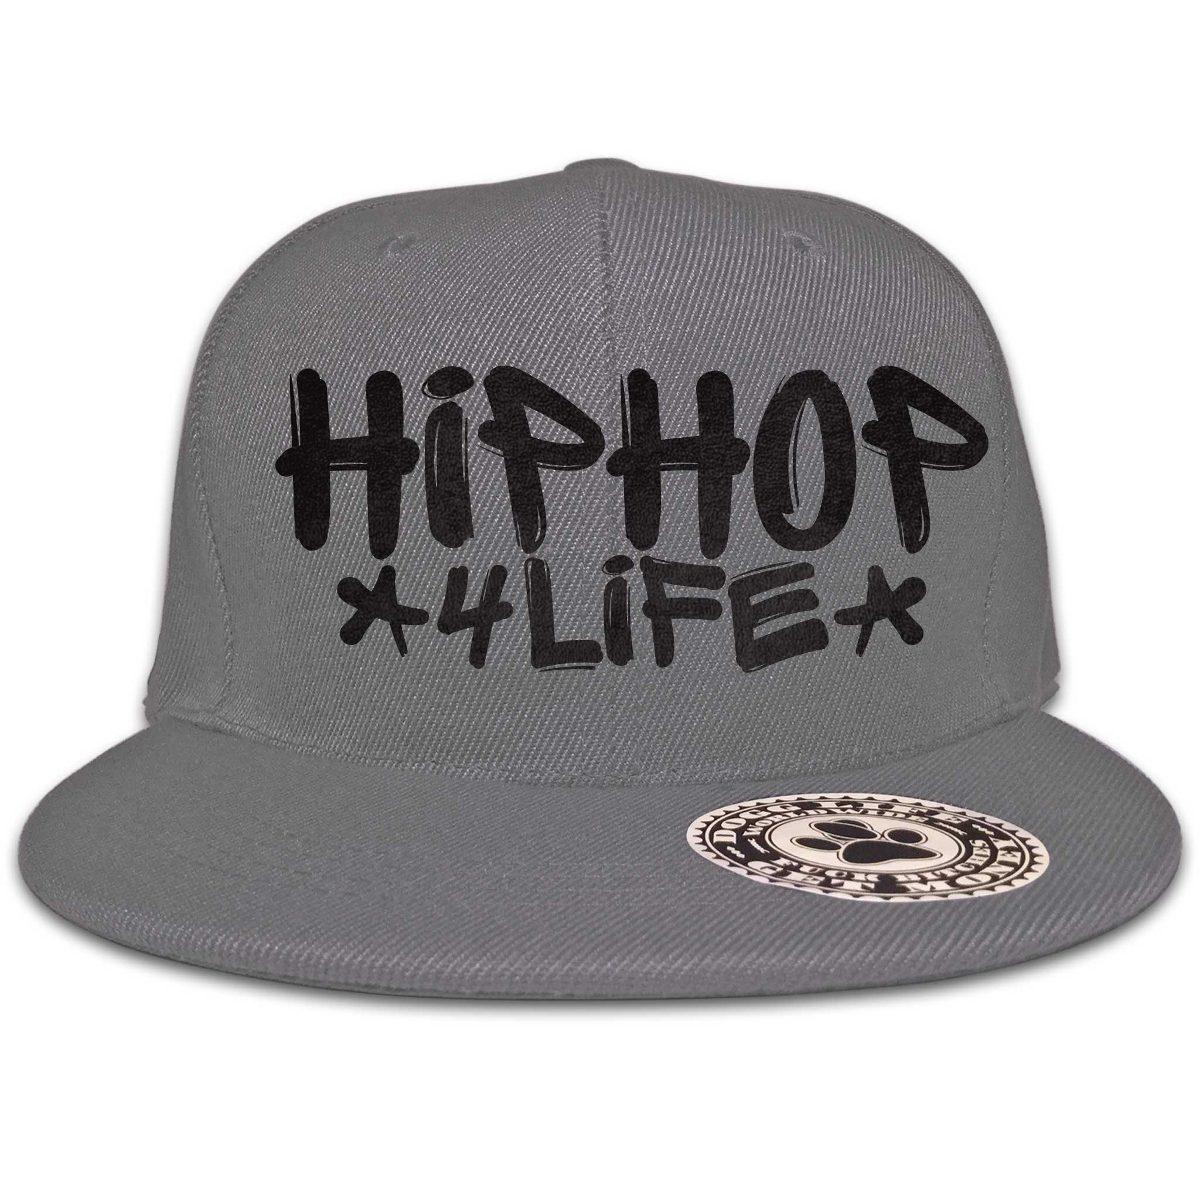 a723ddddffd50 gorras hip hop 4 life dogg life snapback gangsta rap. Cargando zoom.